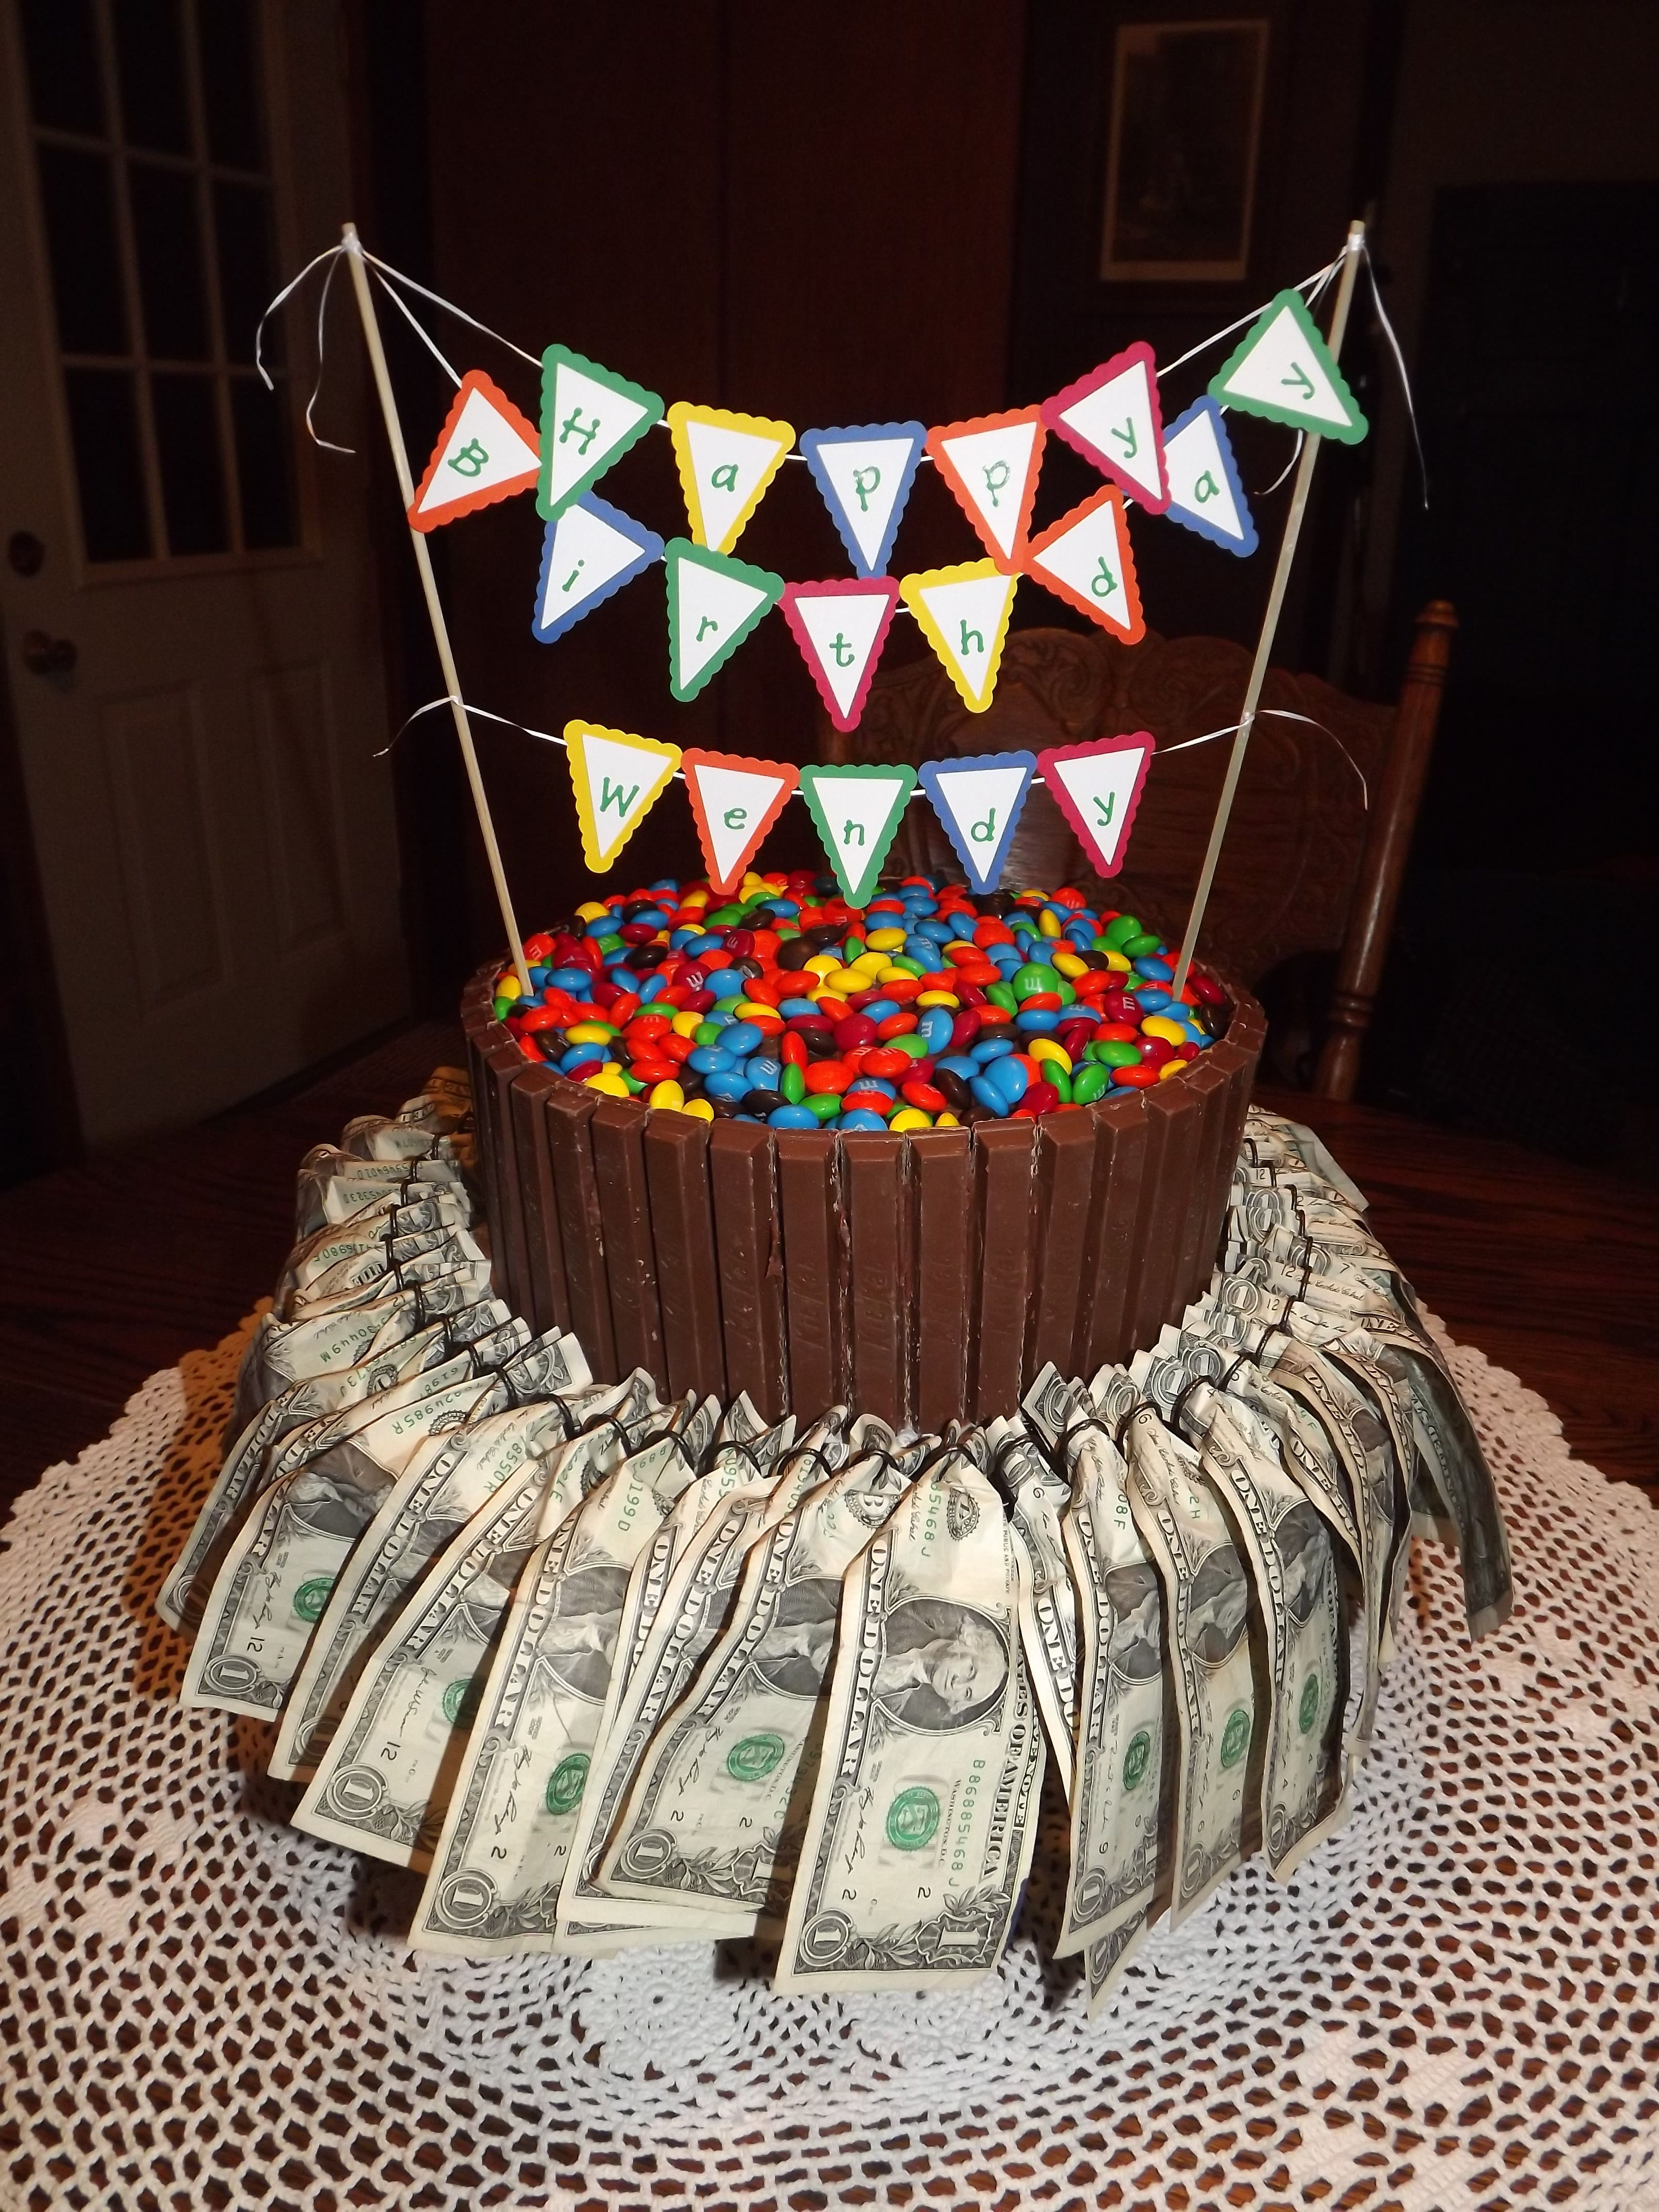 50th Birthday Cake With 50 One Dollar Bills Hint Hint